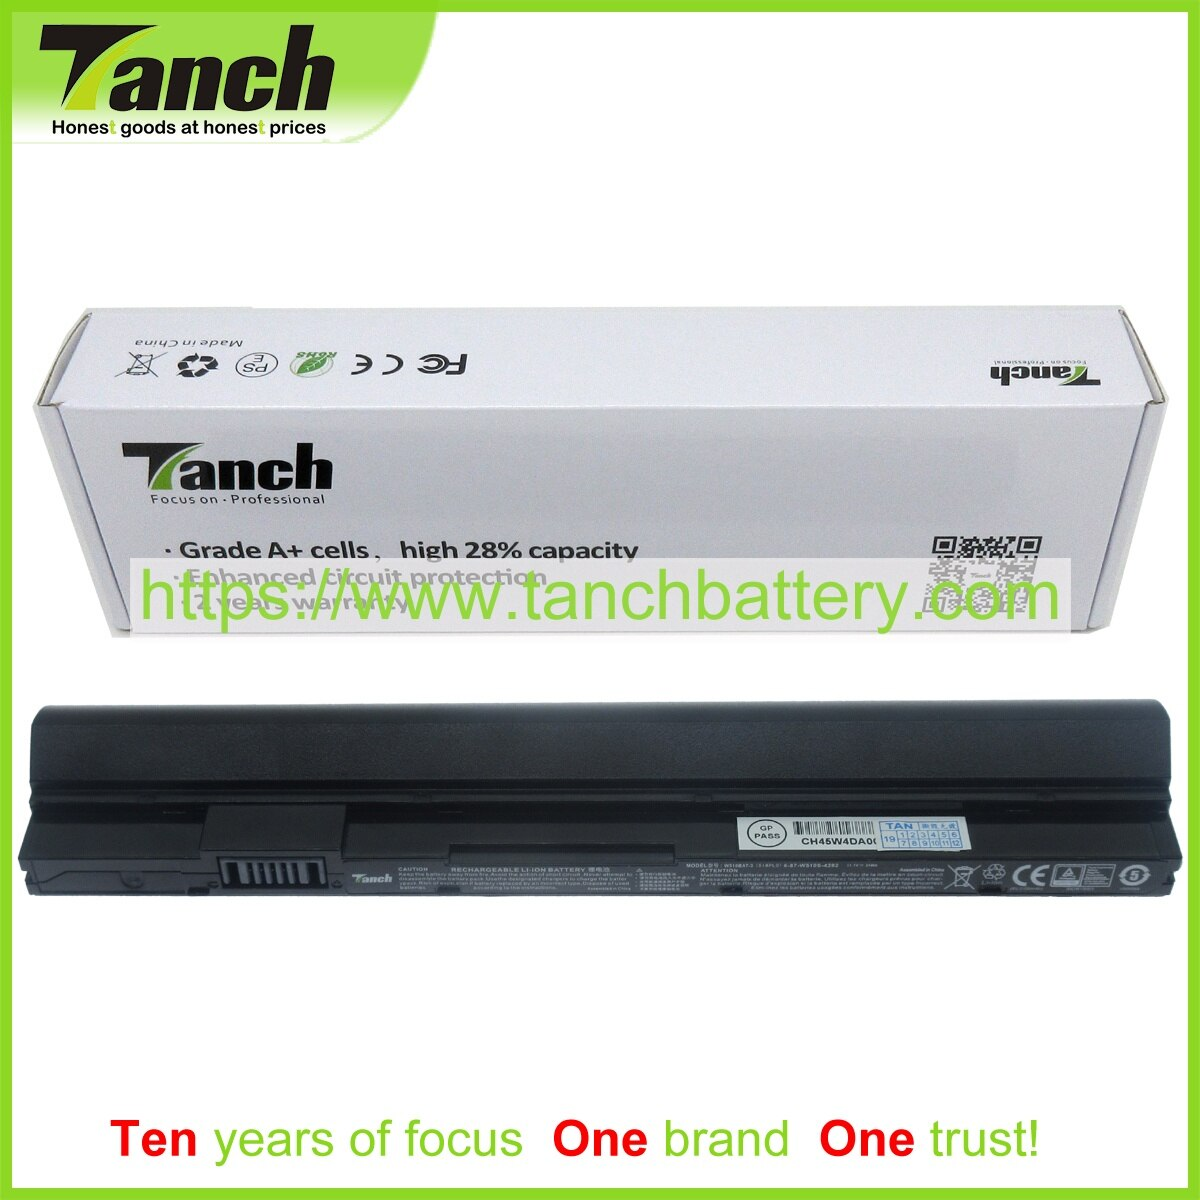 Tanch بطارية كمبيوتر محمول ل CLEVO W510BAT-3 6-87-W510S-4291 6-87-W51LS-4UF 6-87-W510S-4FU1 W510S 11.1V 3 الخليوي